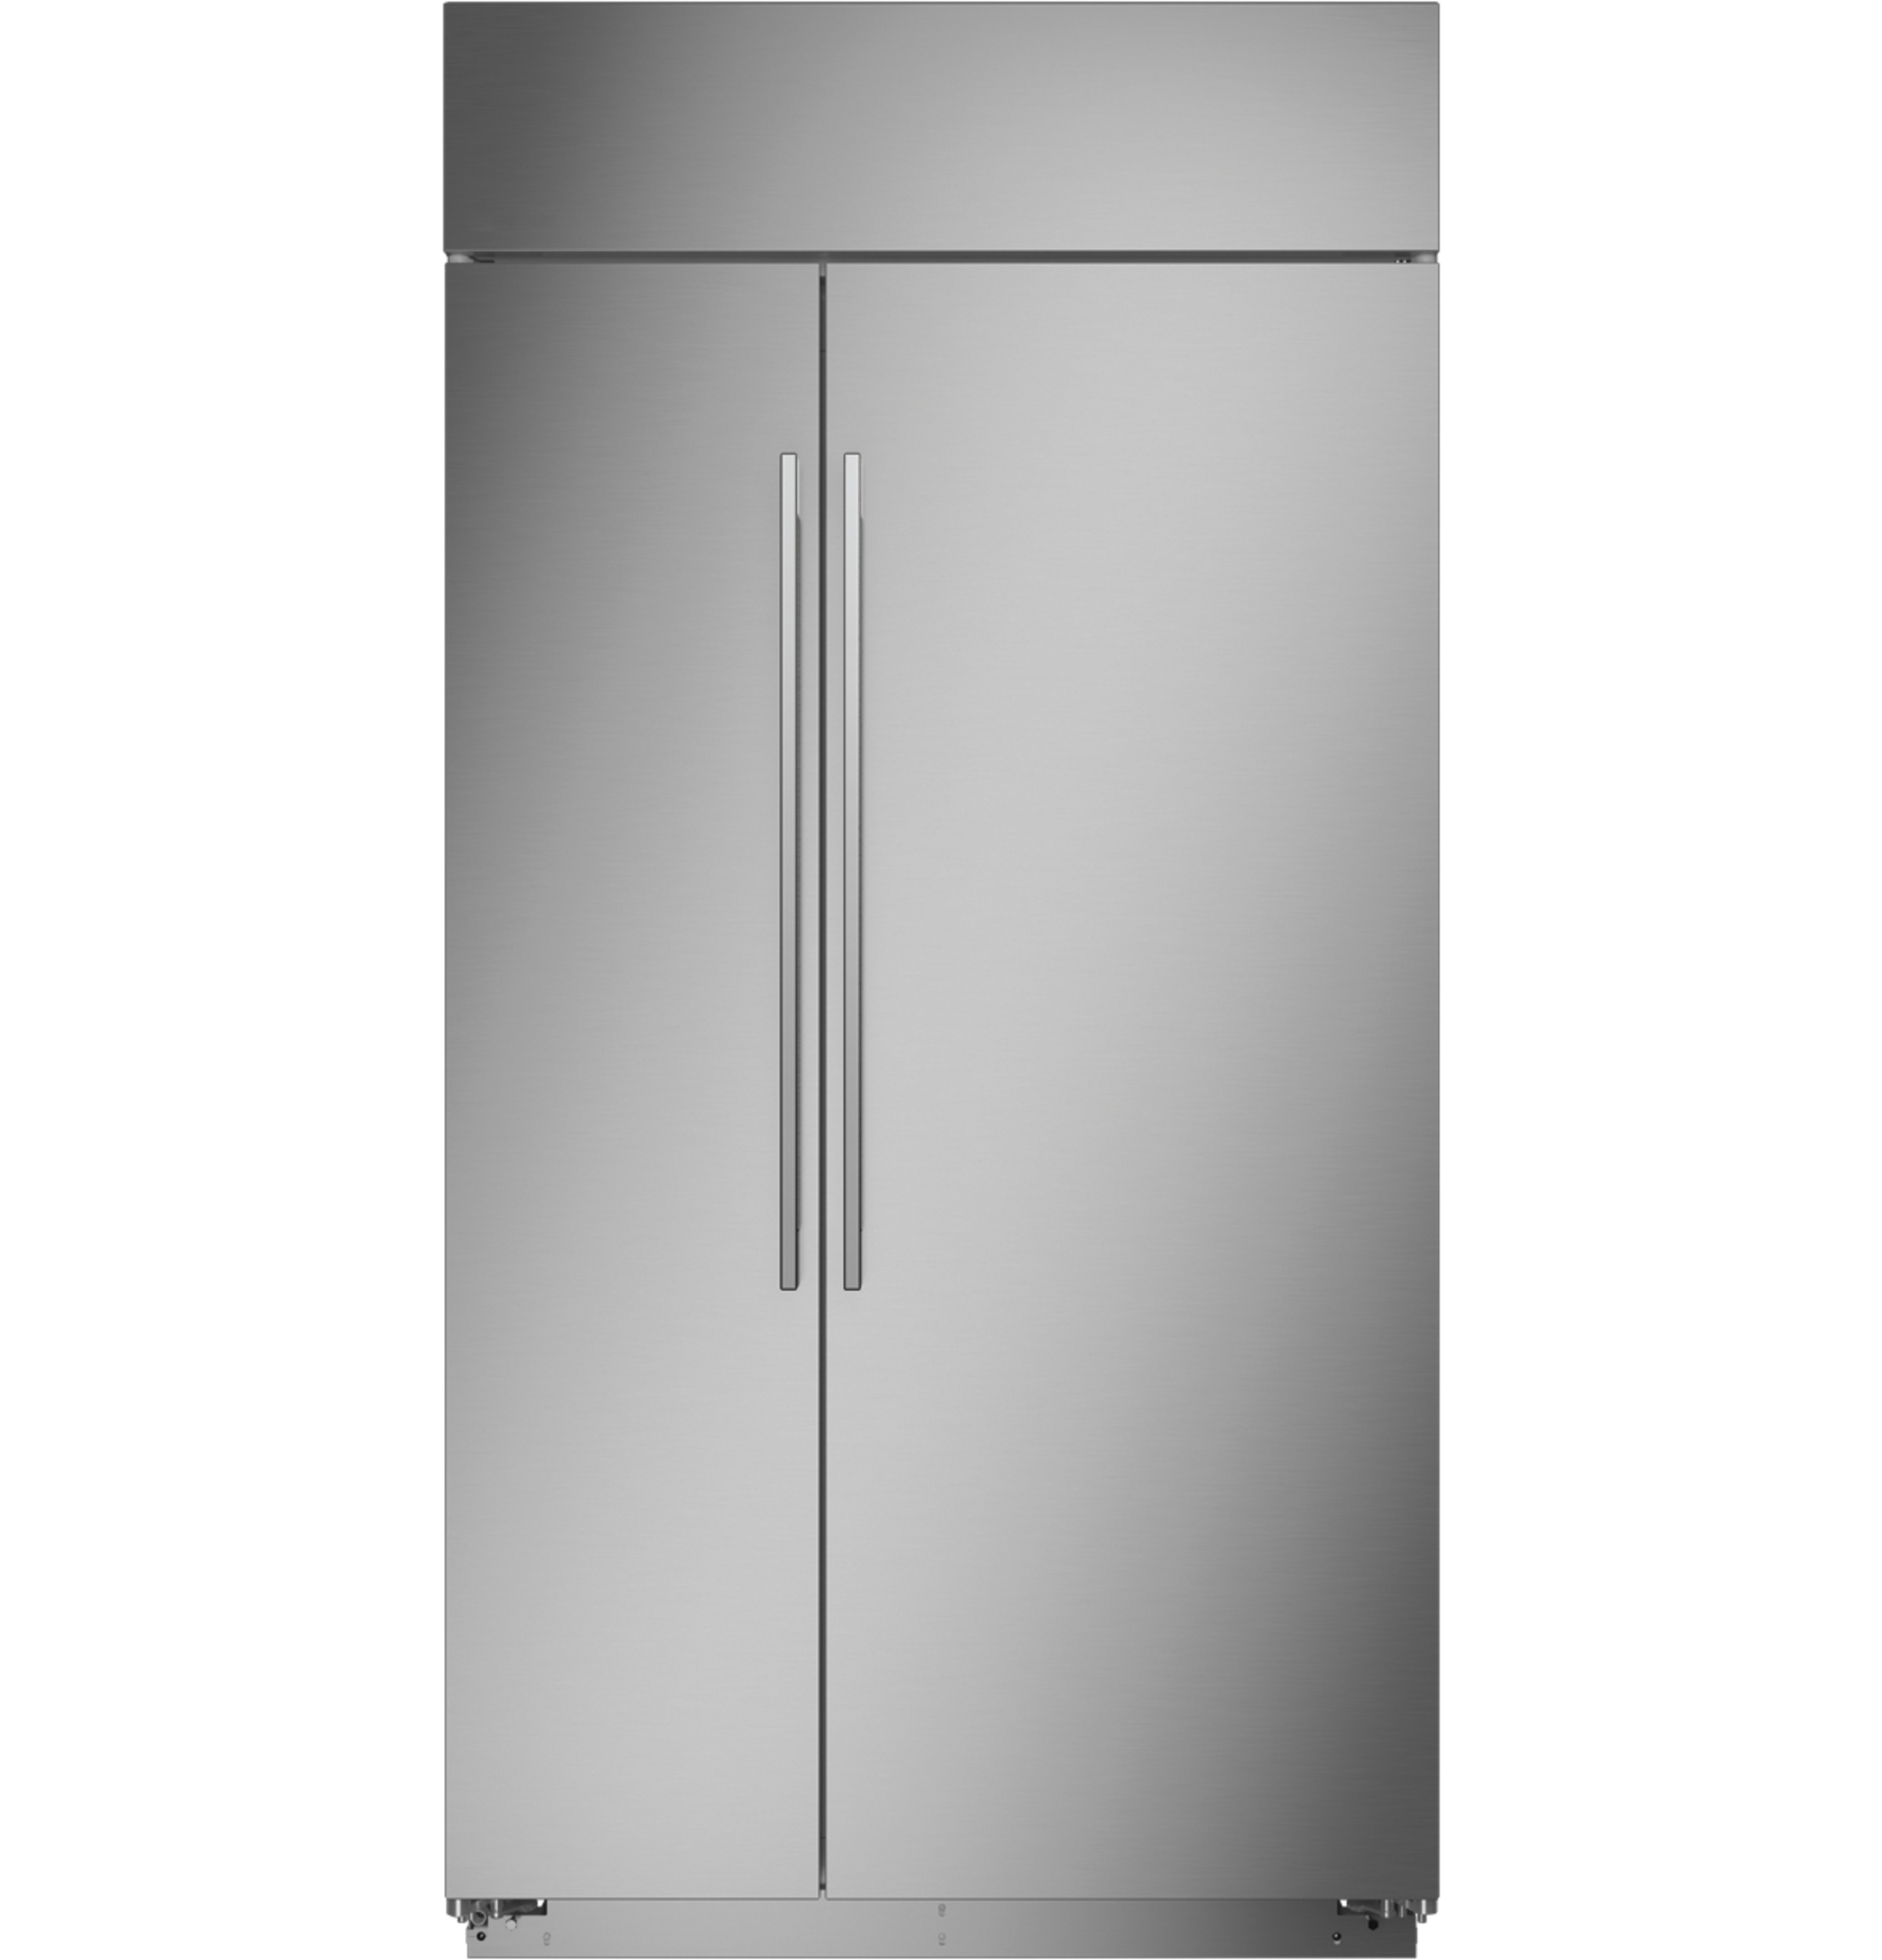 "Monogram Monogram 42"" Smart Built-In Side-by-Side Refrigerator"